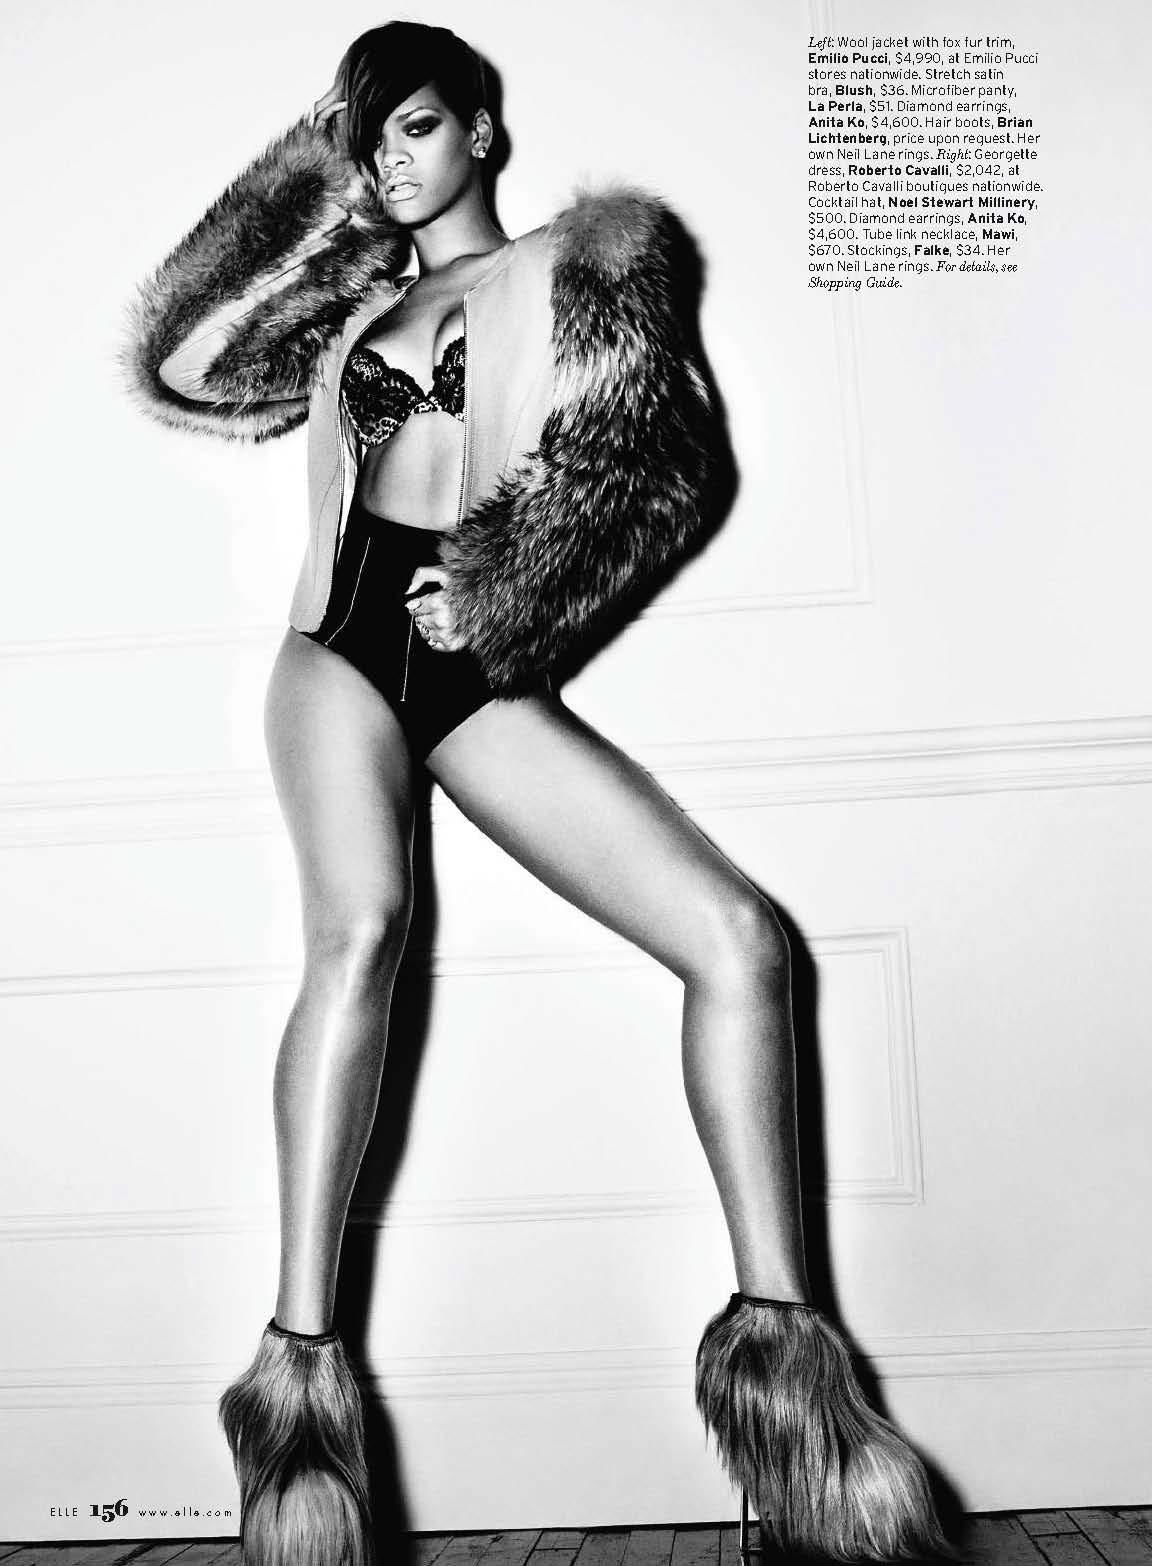 Hair Boots - Rihanna - Elle Magazine